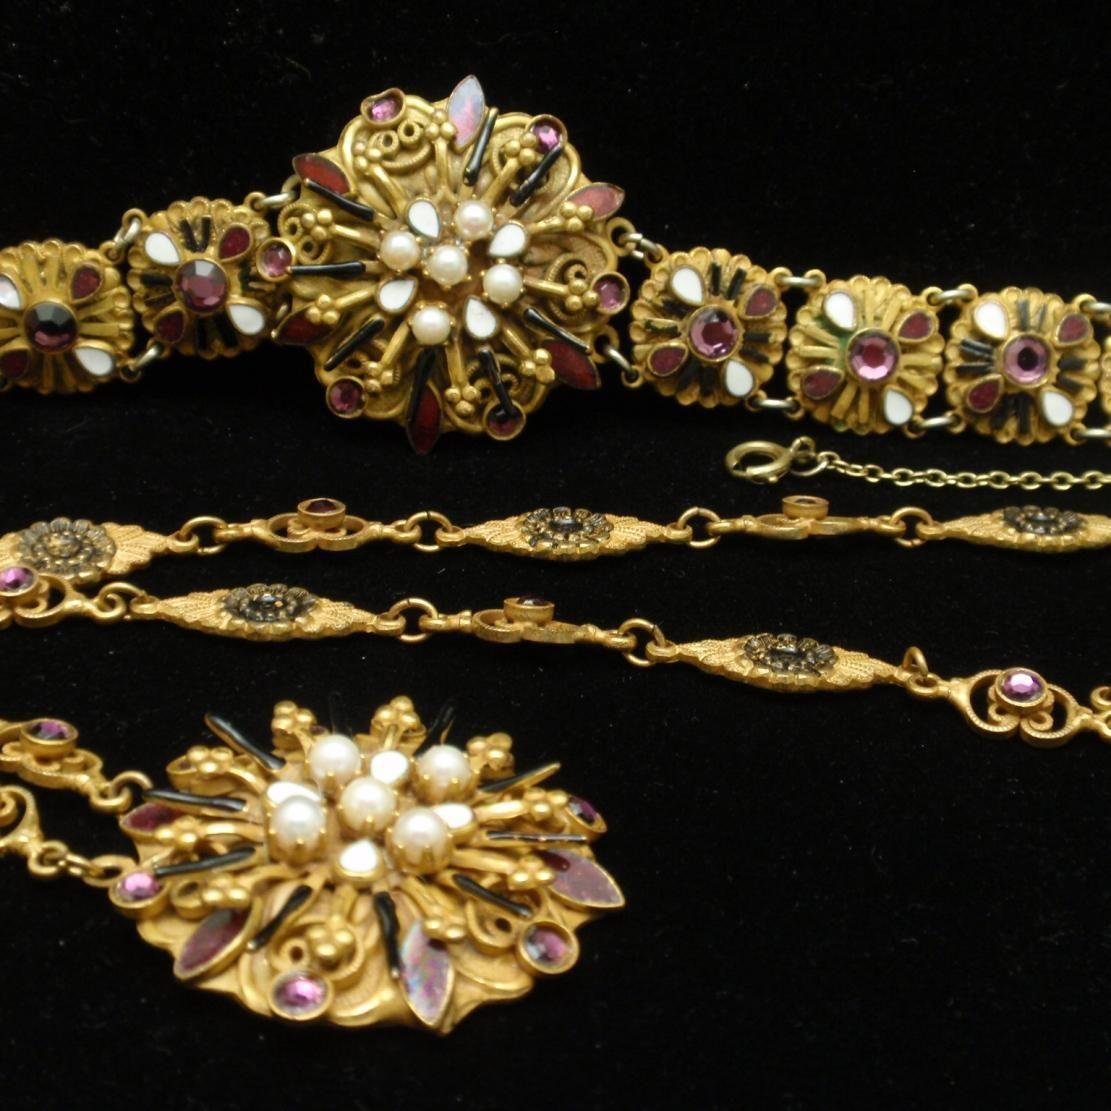 Hobe necklace bracelet set austrohungarian influenced design vintage